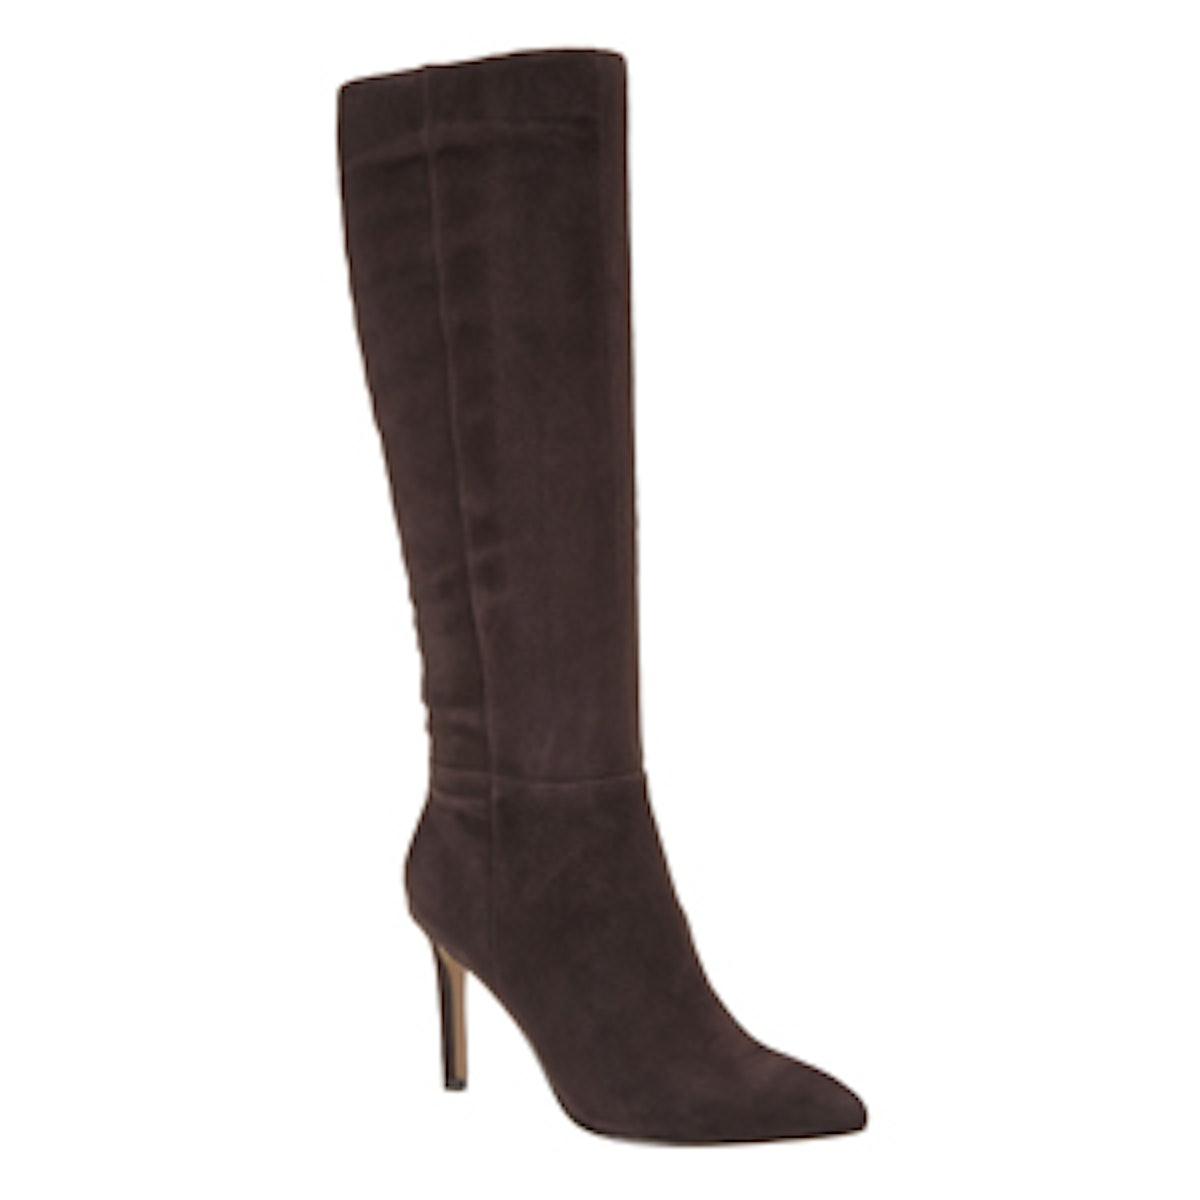 Evyn Pointy Toe Tall Boots